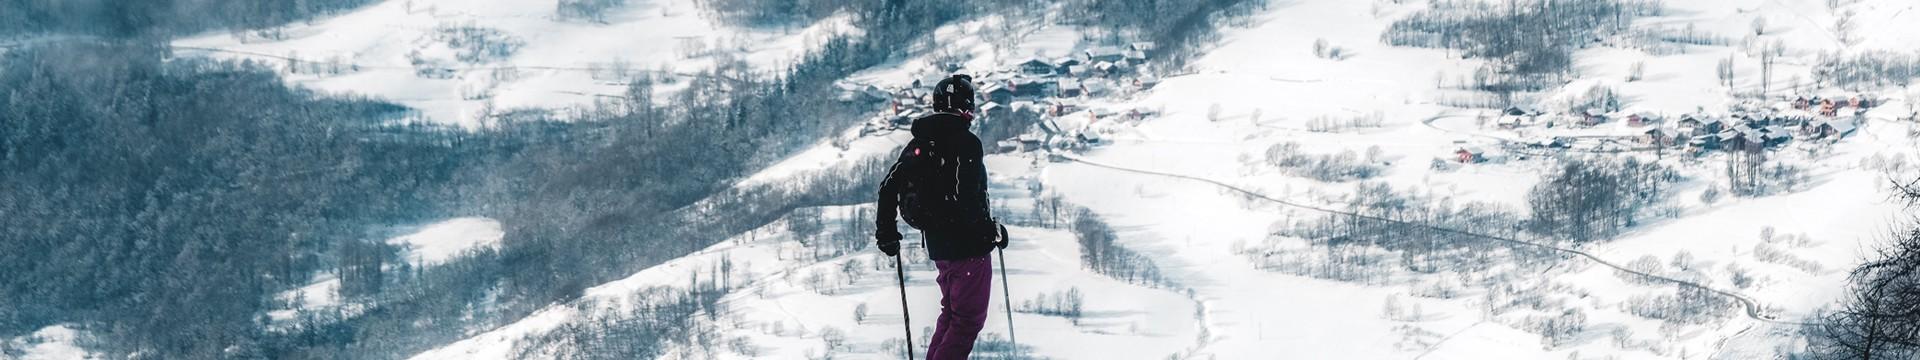 ski-04-8872